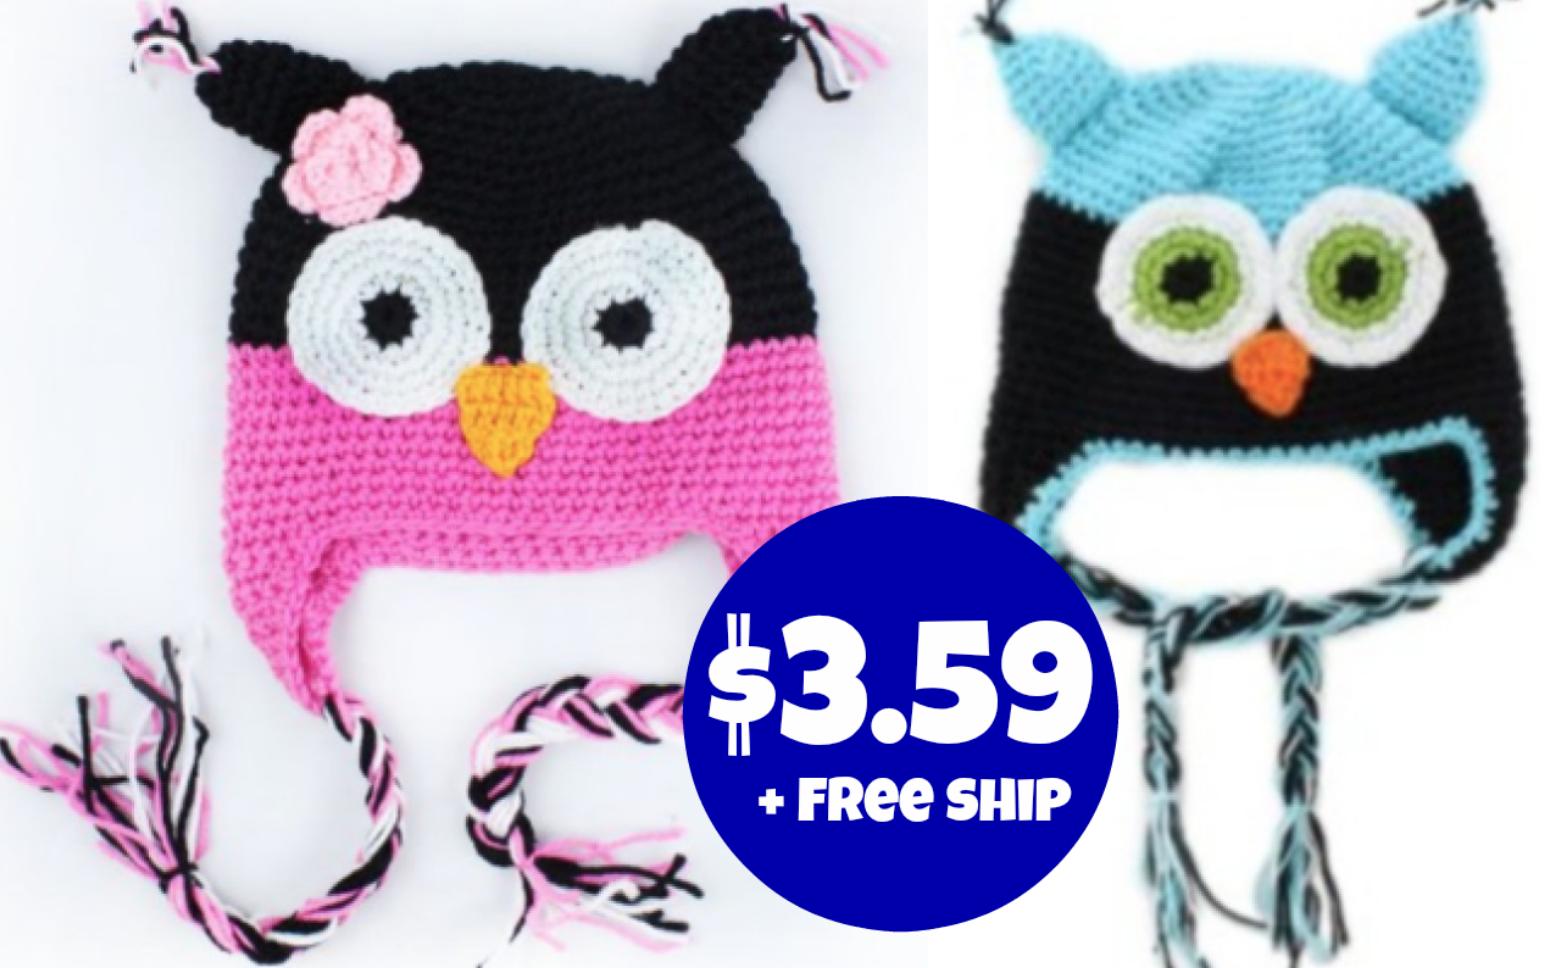 http://www.thebinderladies.com/2014/10/amazon-baby-toddler-knit-beanies-hats.html#.VE8J-L7dtbw